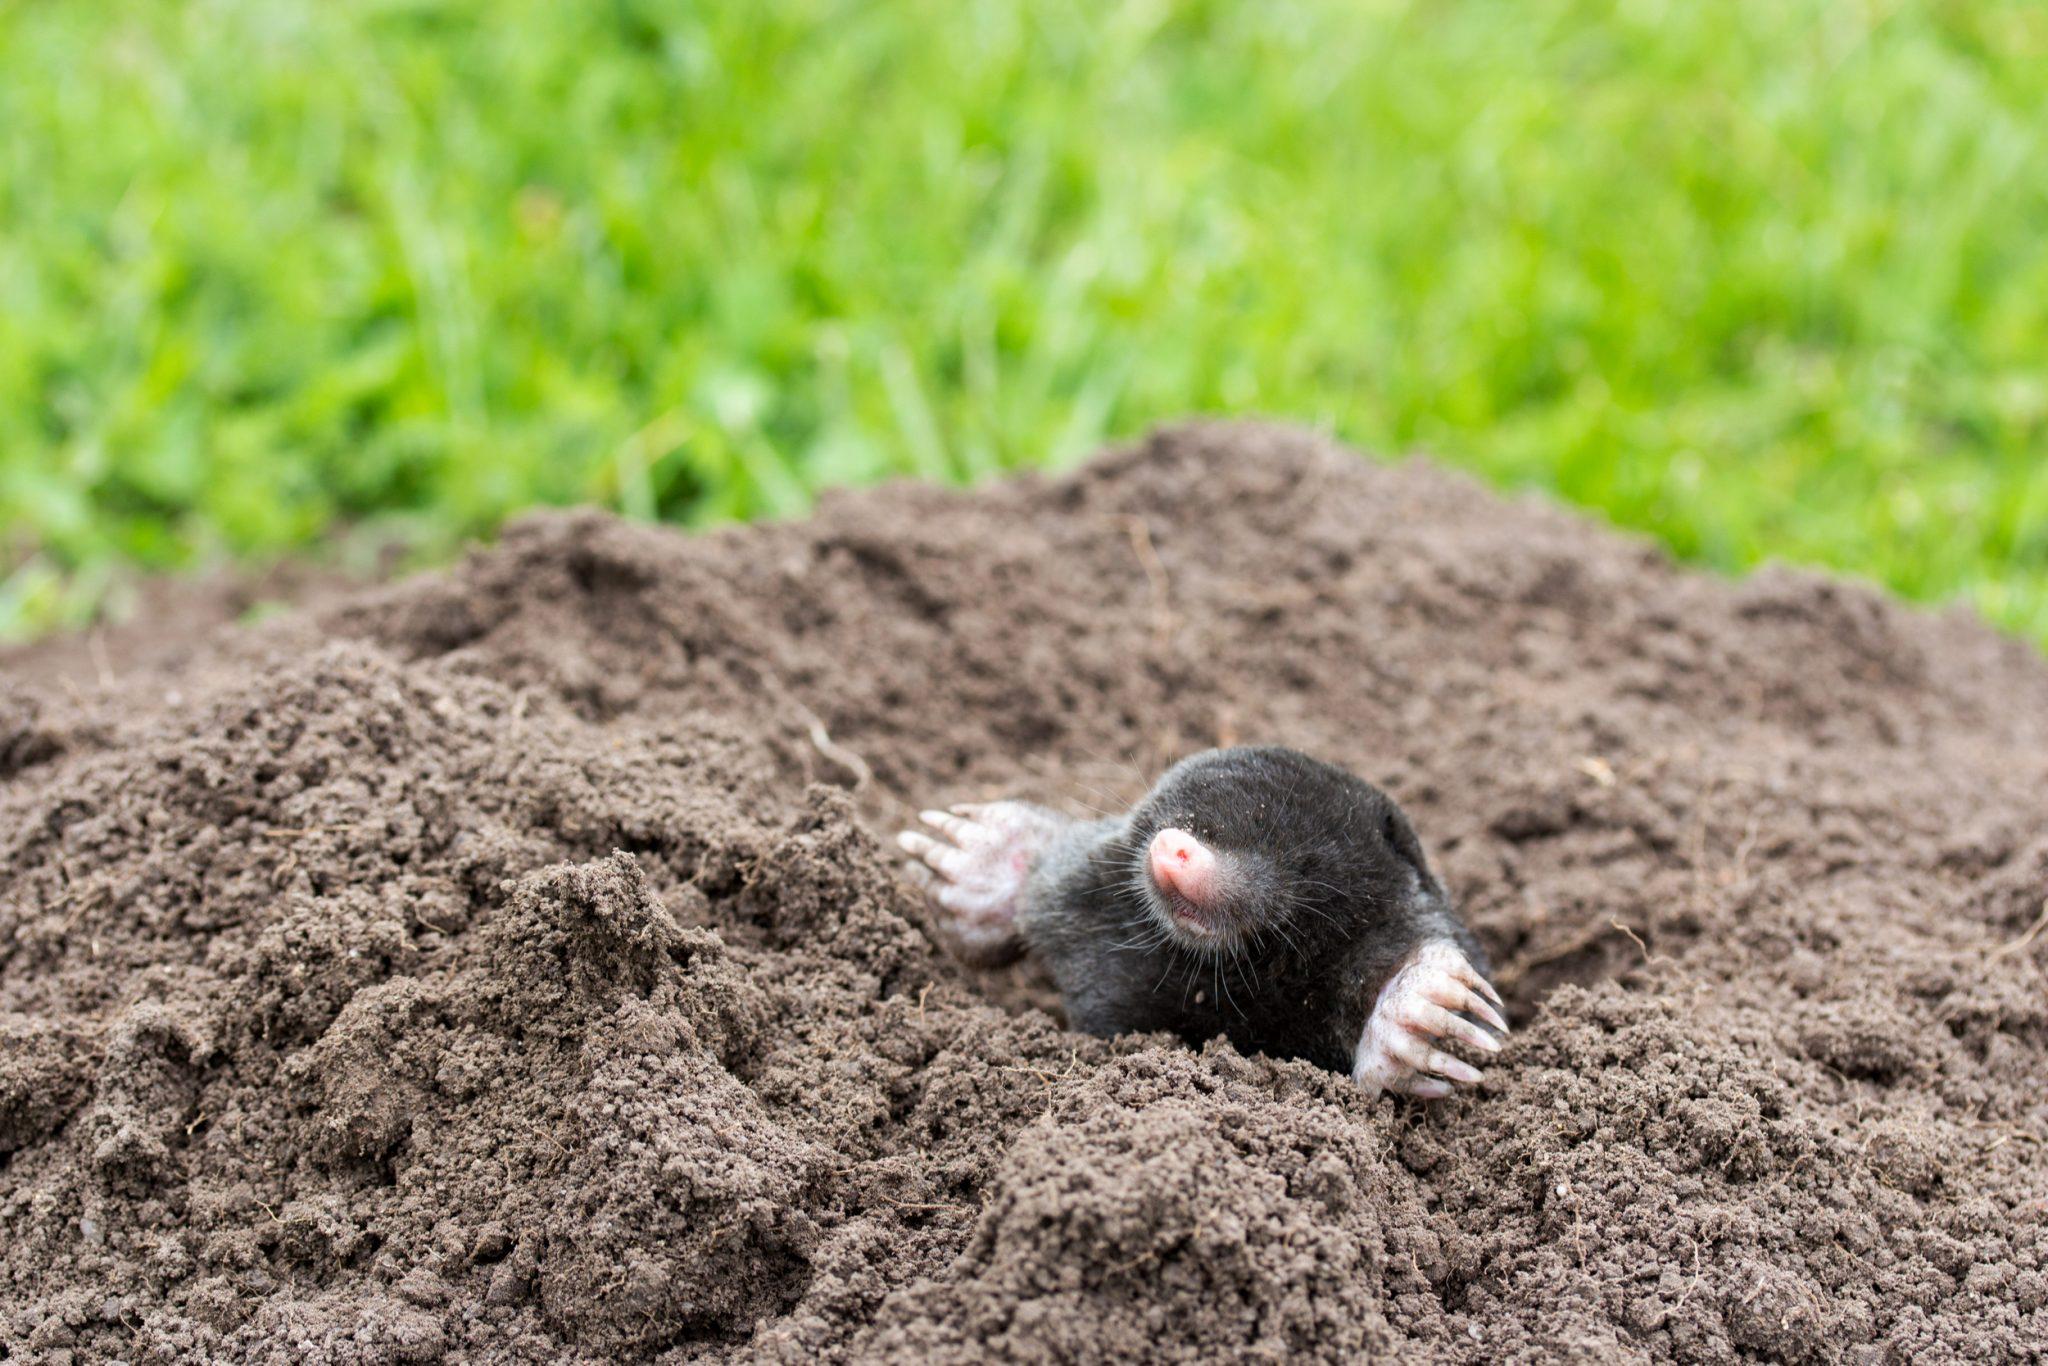 mole removal tips